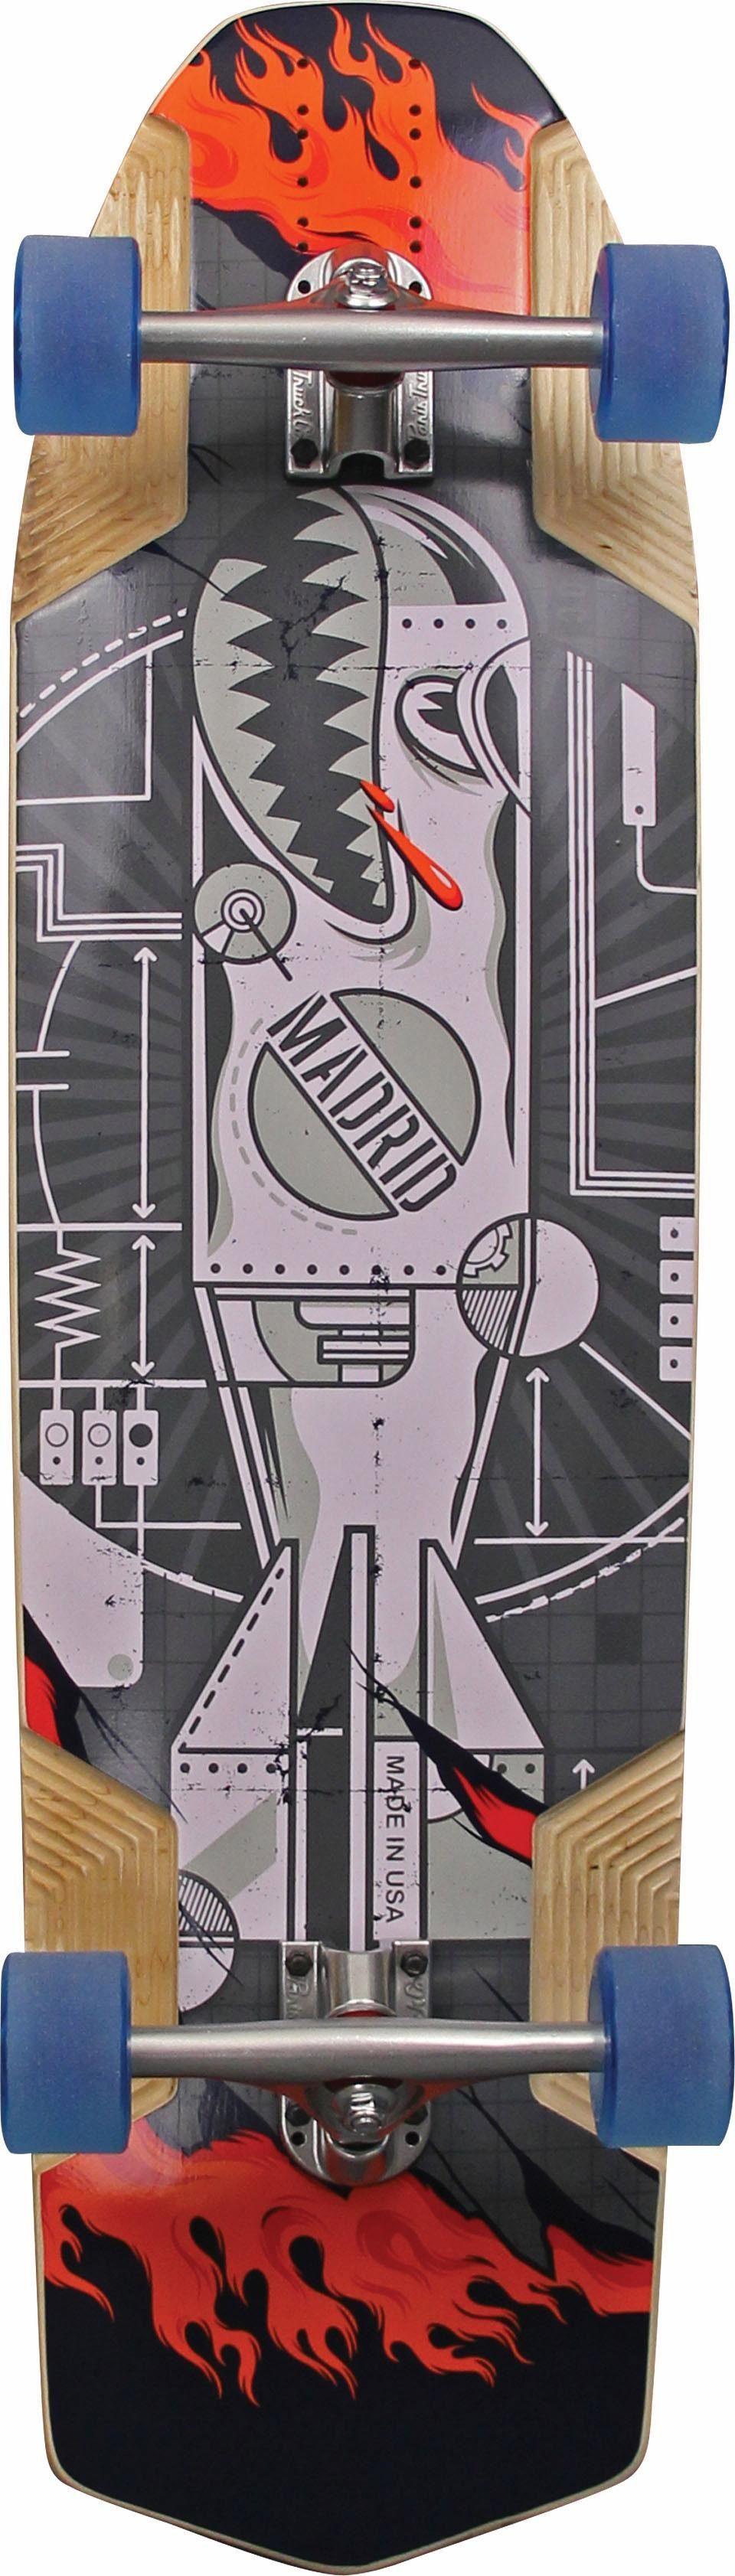 madrid SKATEBOARDS Longboard »WMD Maxed«, mit verstellbarem Achsabstand